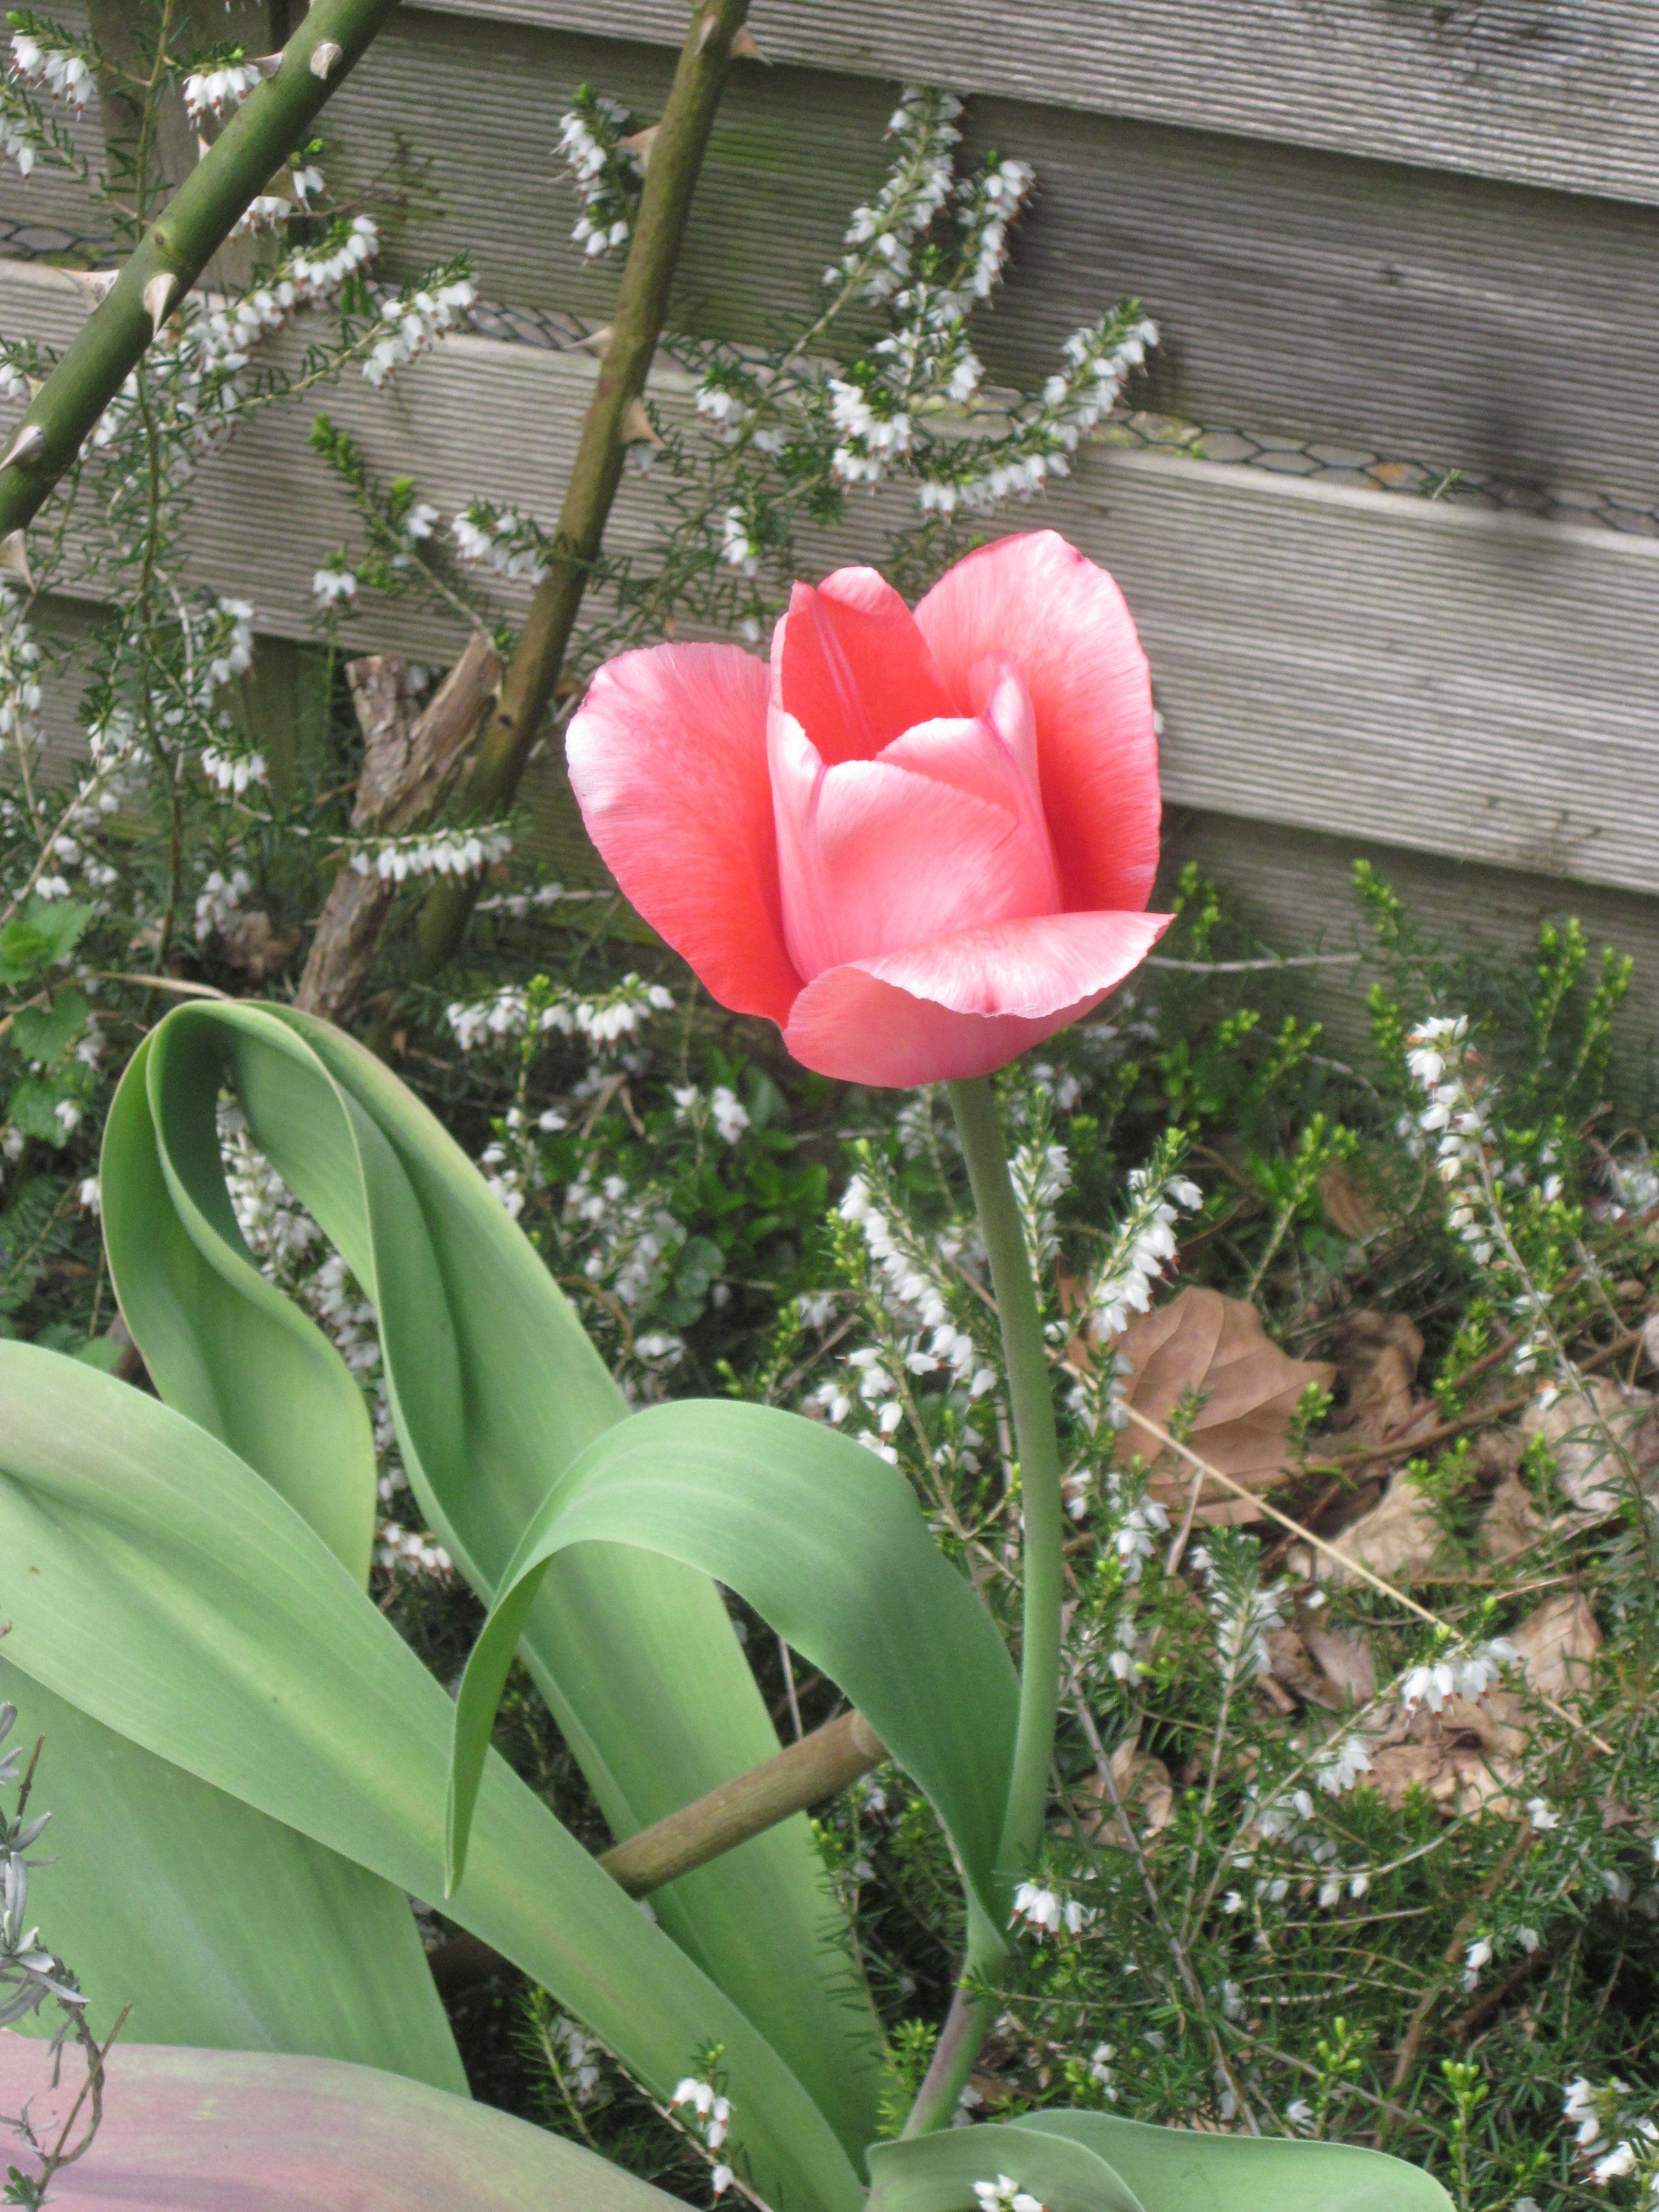 Tulpen, Frühjahrblumen, Zwiebelpflanzen, Tulpe rose